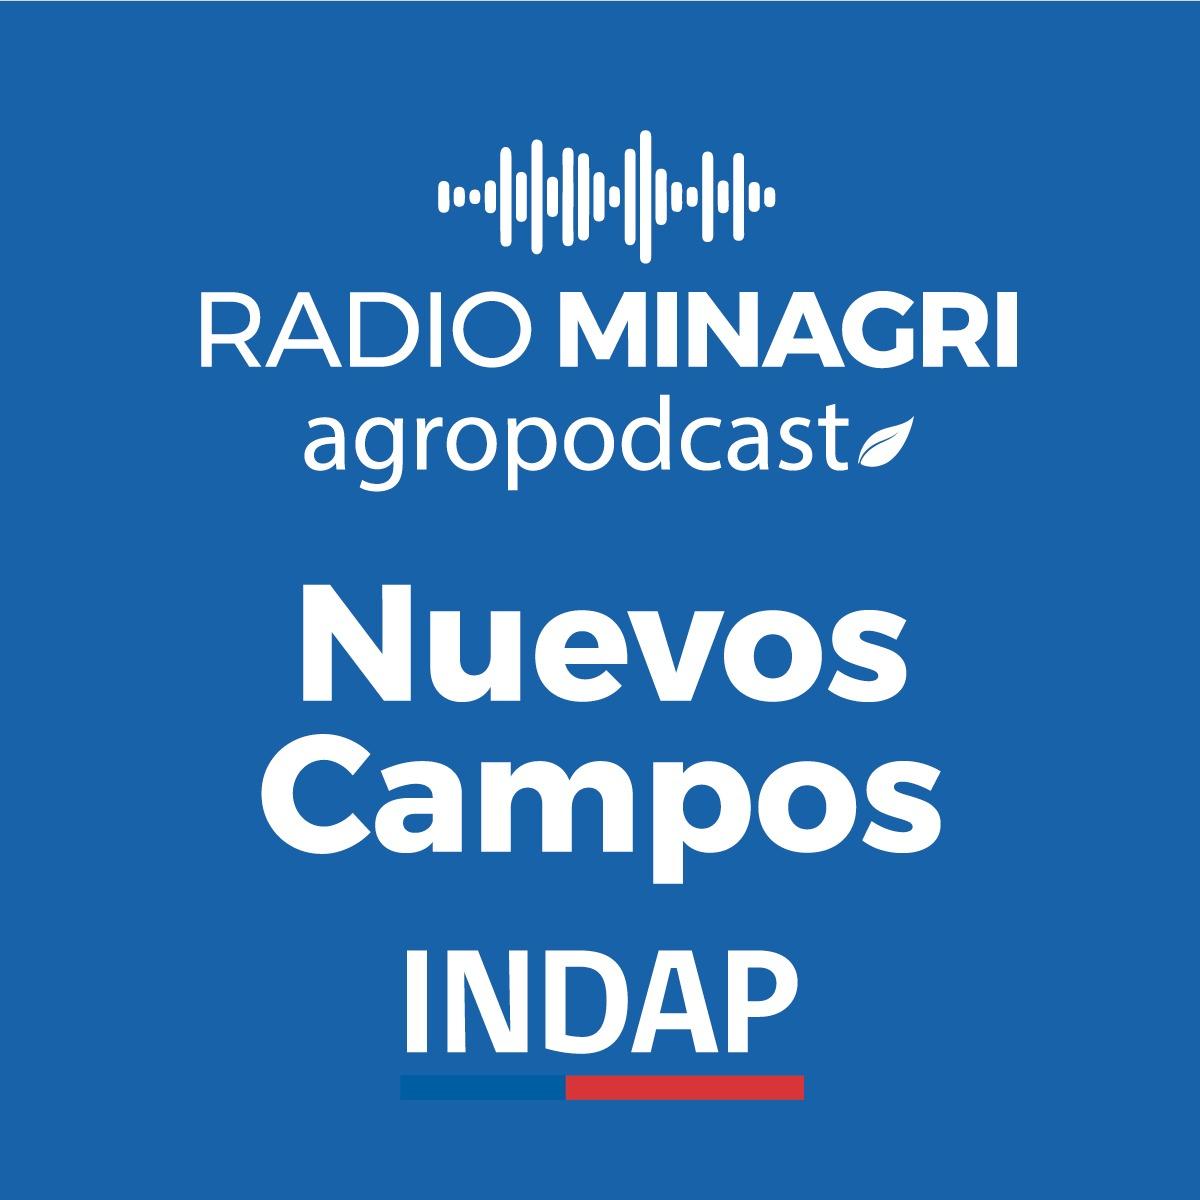 Nuevos campos – Episodio 31: Apoyo a agricultores tras emergencia agrícola